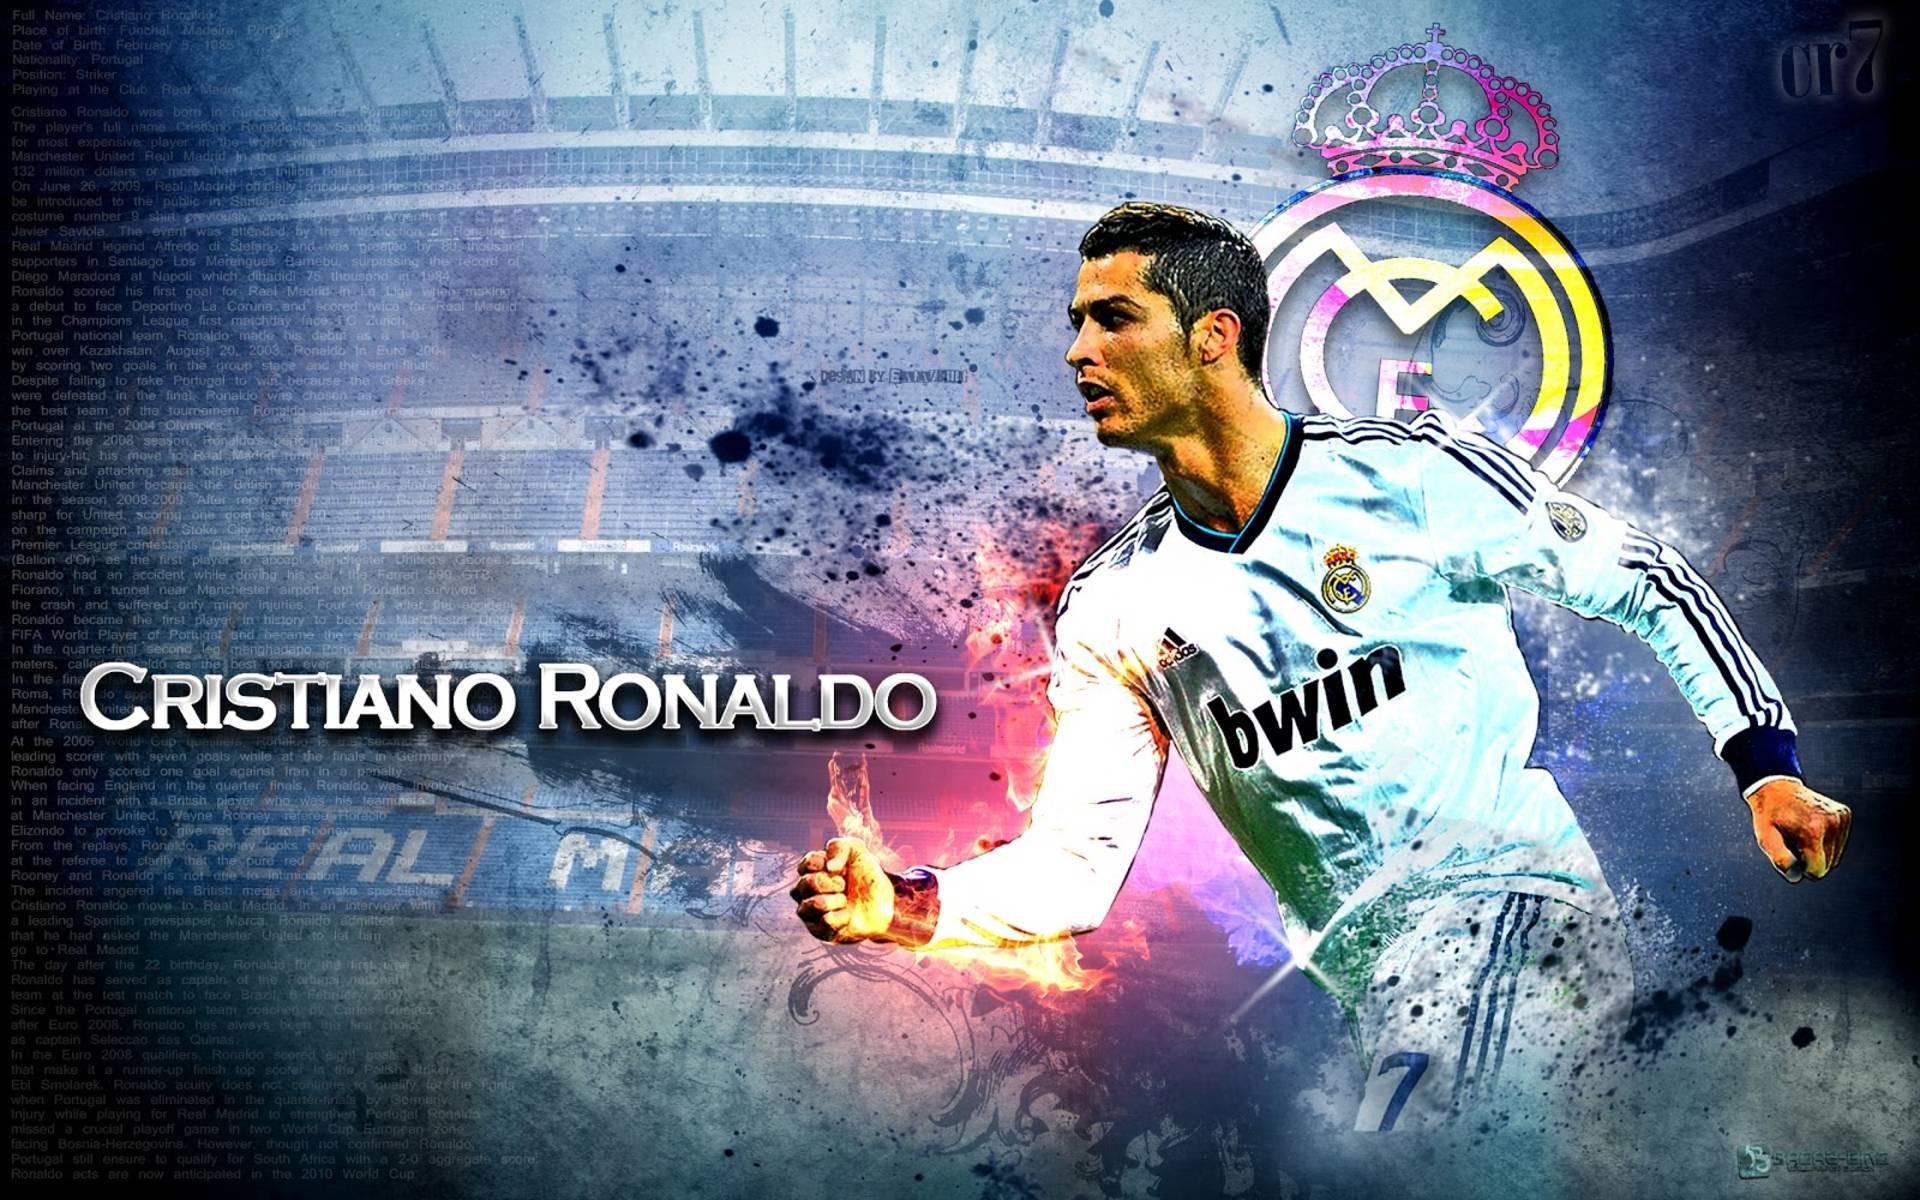 Cristiano Ronaldo HD White Jersey Wallpaper #3407   Foolhardi.